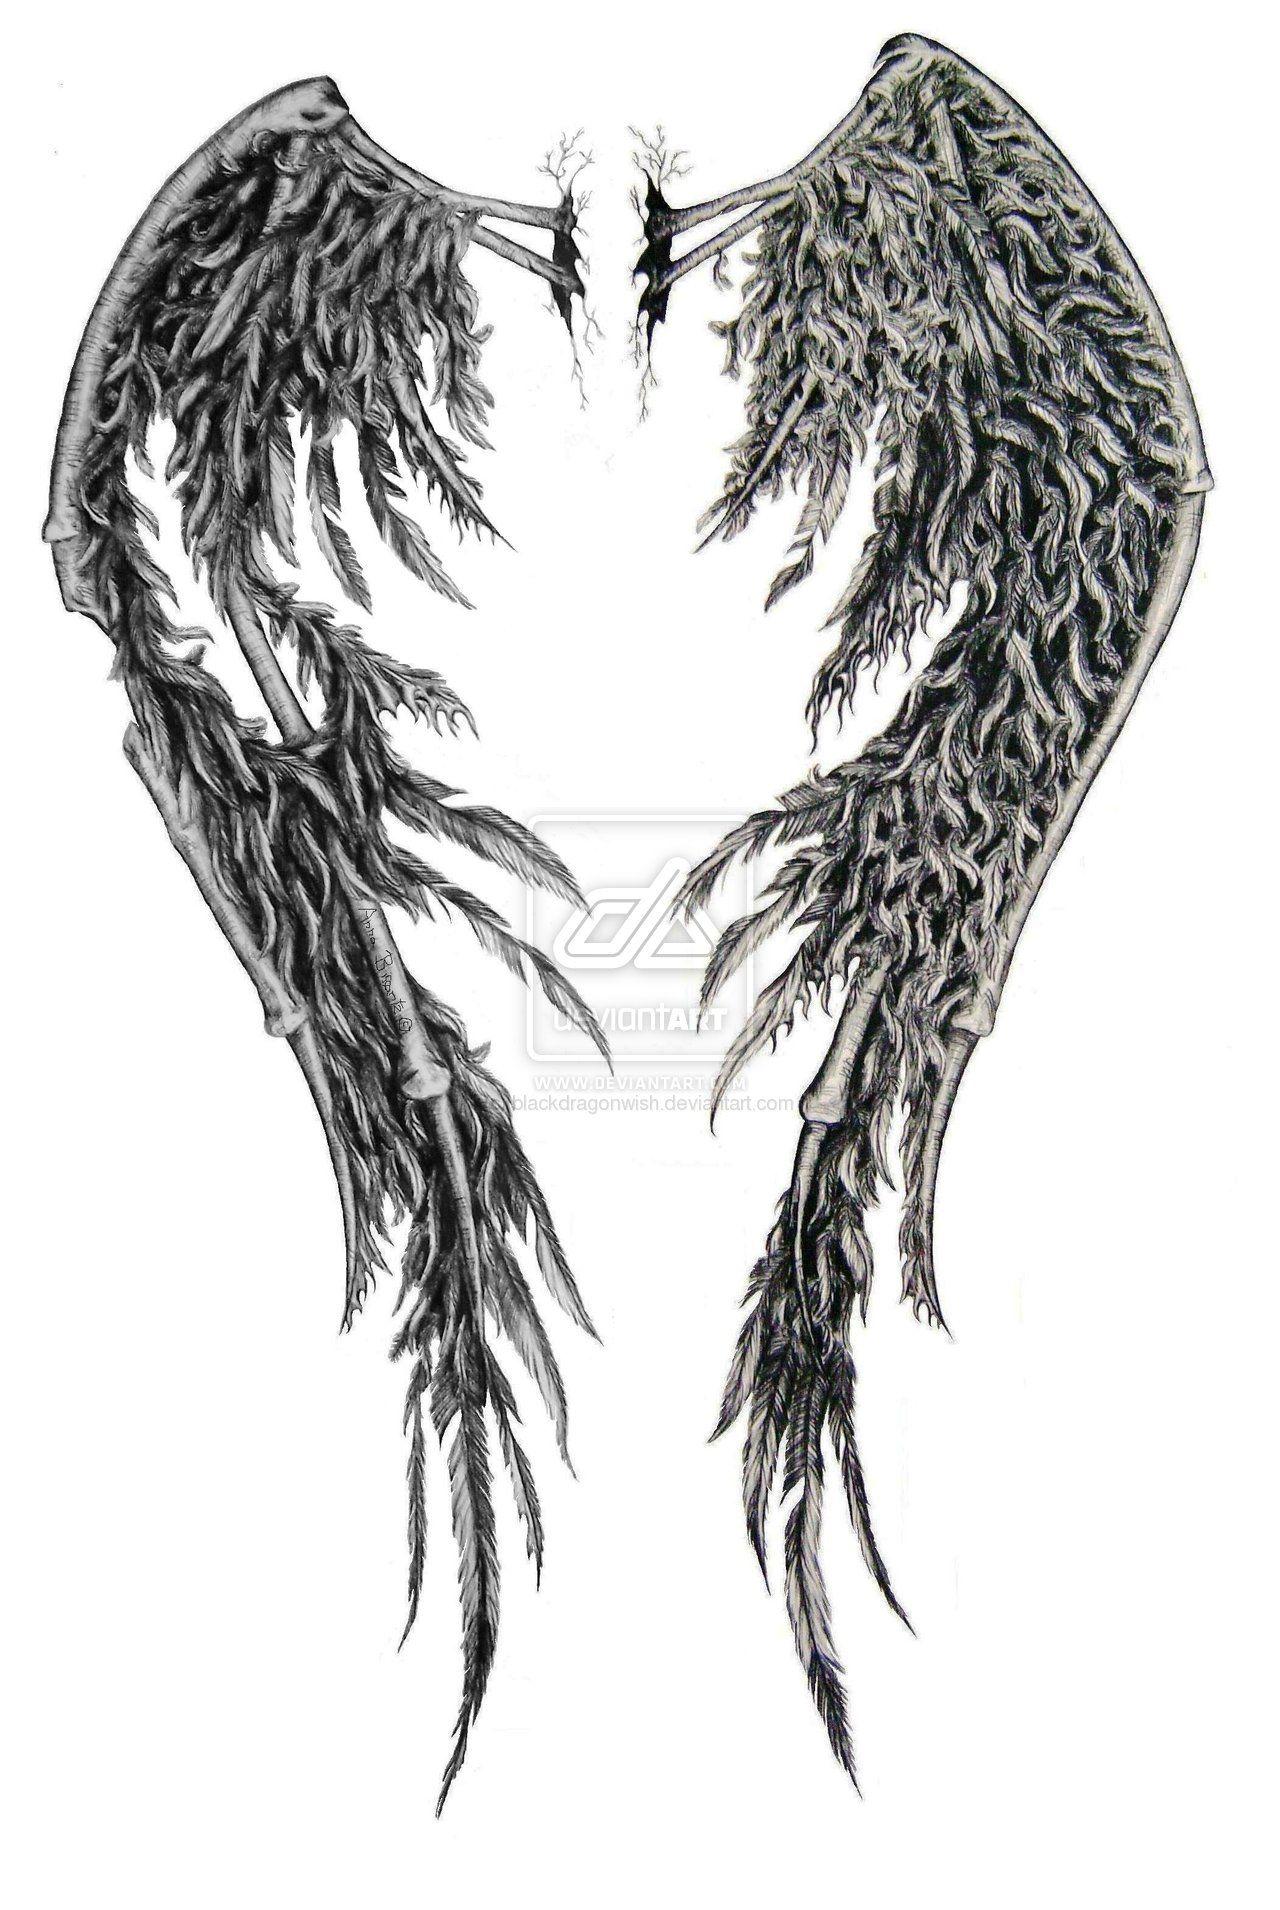 fallen angel wings tattoo fallen angel wings edited by swarzeztier designs interfaces tattoo. Black Bedroom Furniture Sets. Home Design Ideas